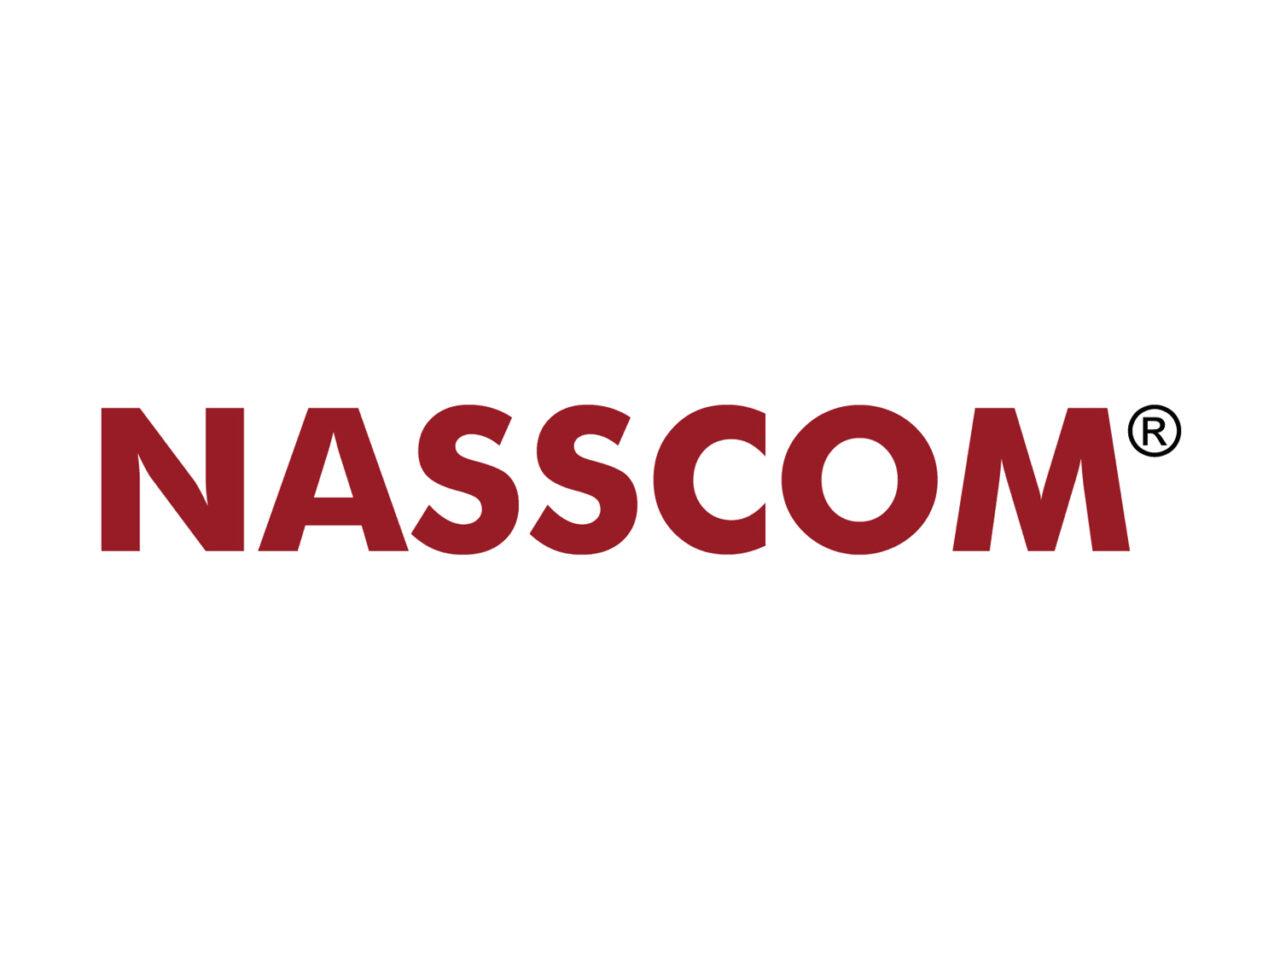 https://genesisrms.com/wp-content/uploads/2021/08/nasscom-logo-big-1280x960.jpg